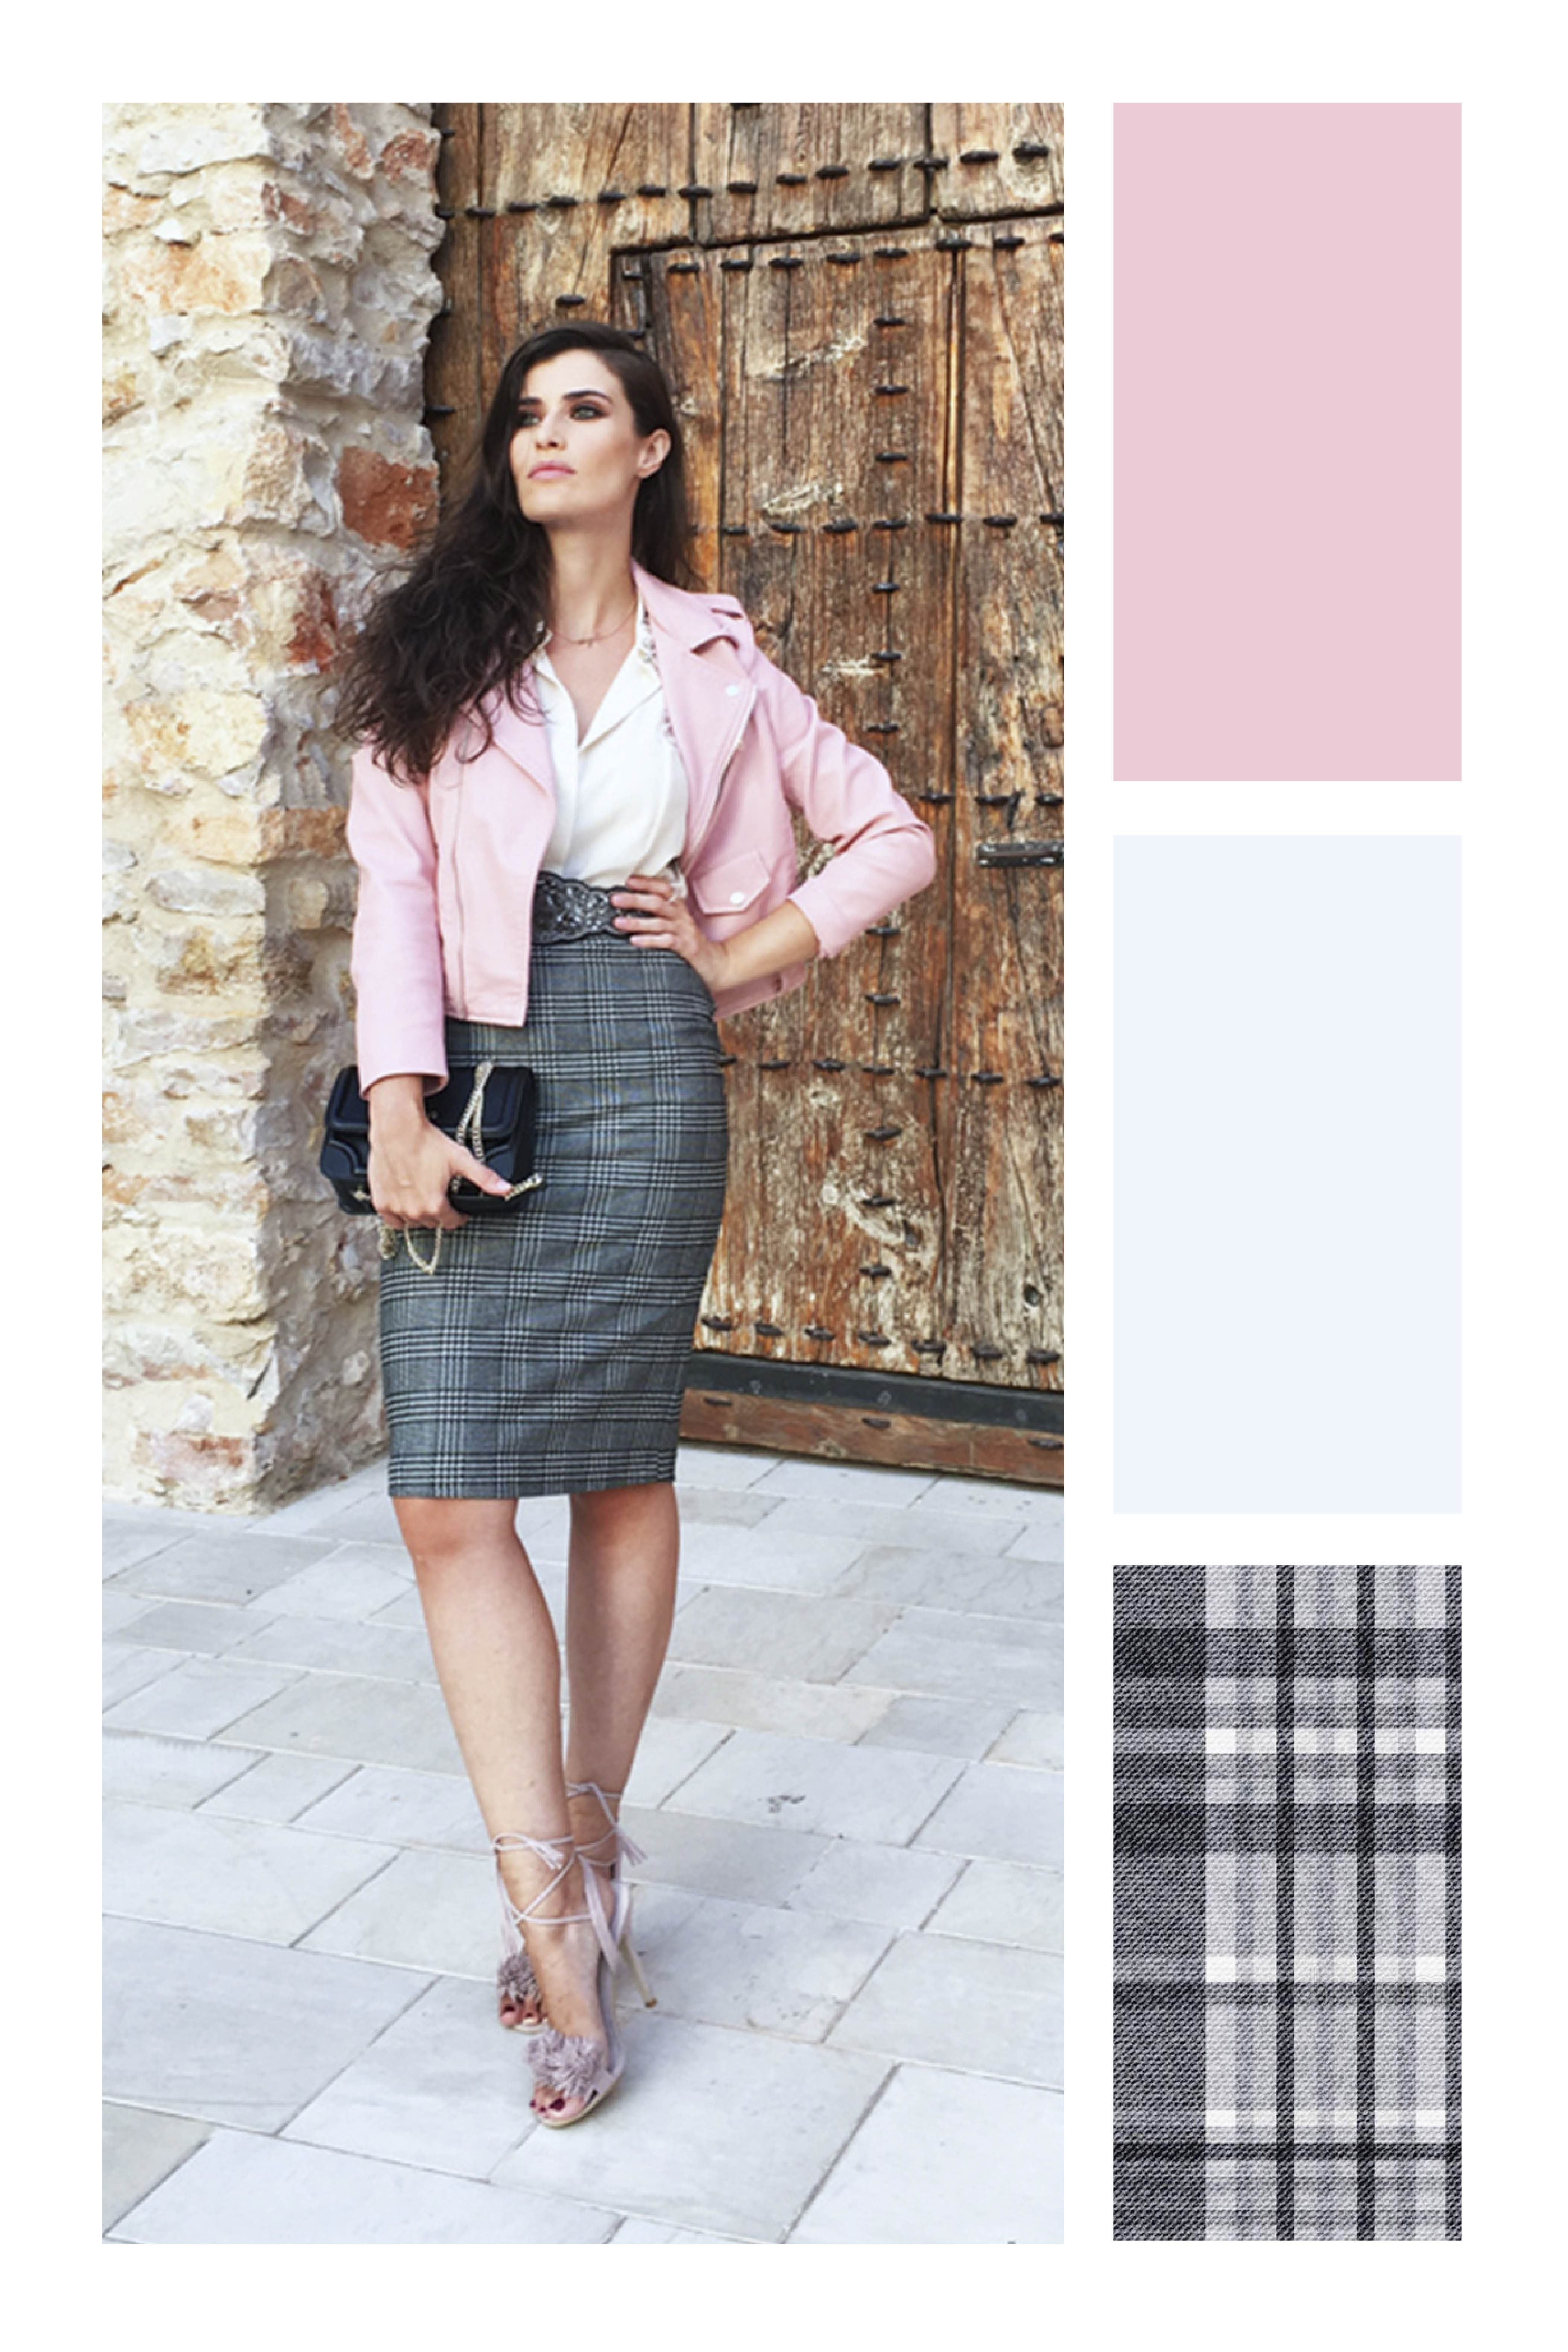 d95eba155b Falda lápiz  cinco estilos para organizar tus atuendos diarios  TiZKKAmoda   blazer  rosa  falda  lápiz  gris  cuadros  look  blusa  blanca